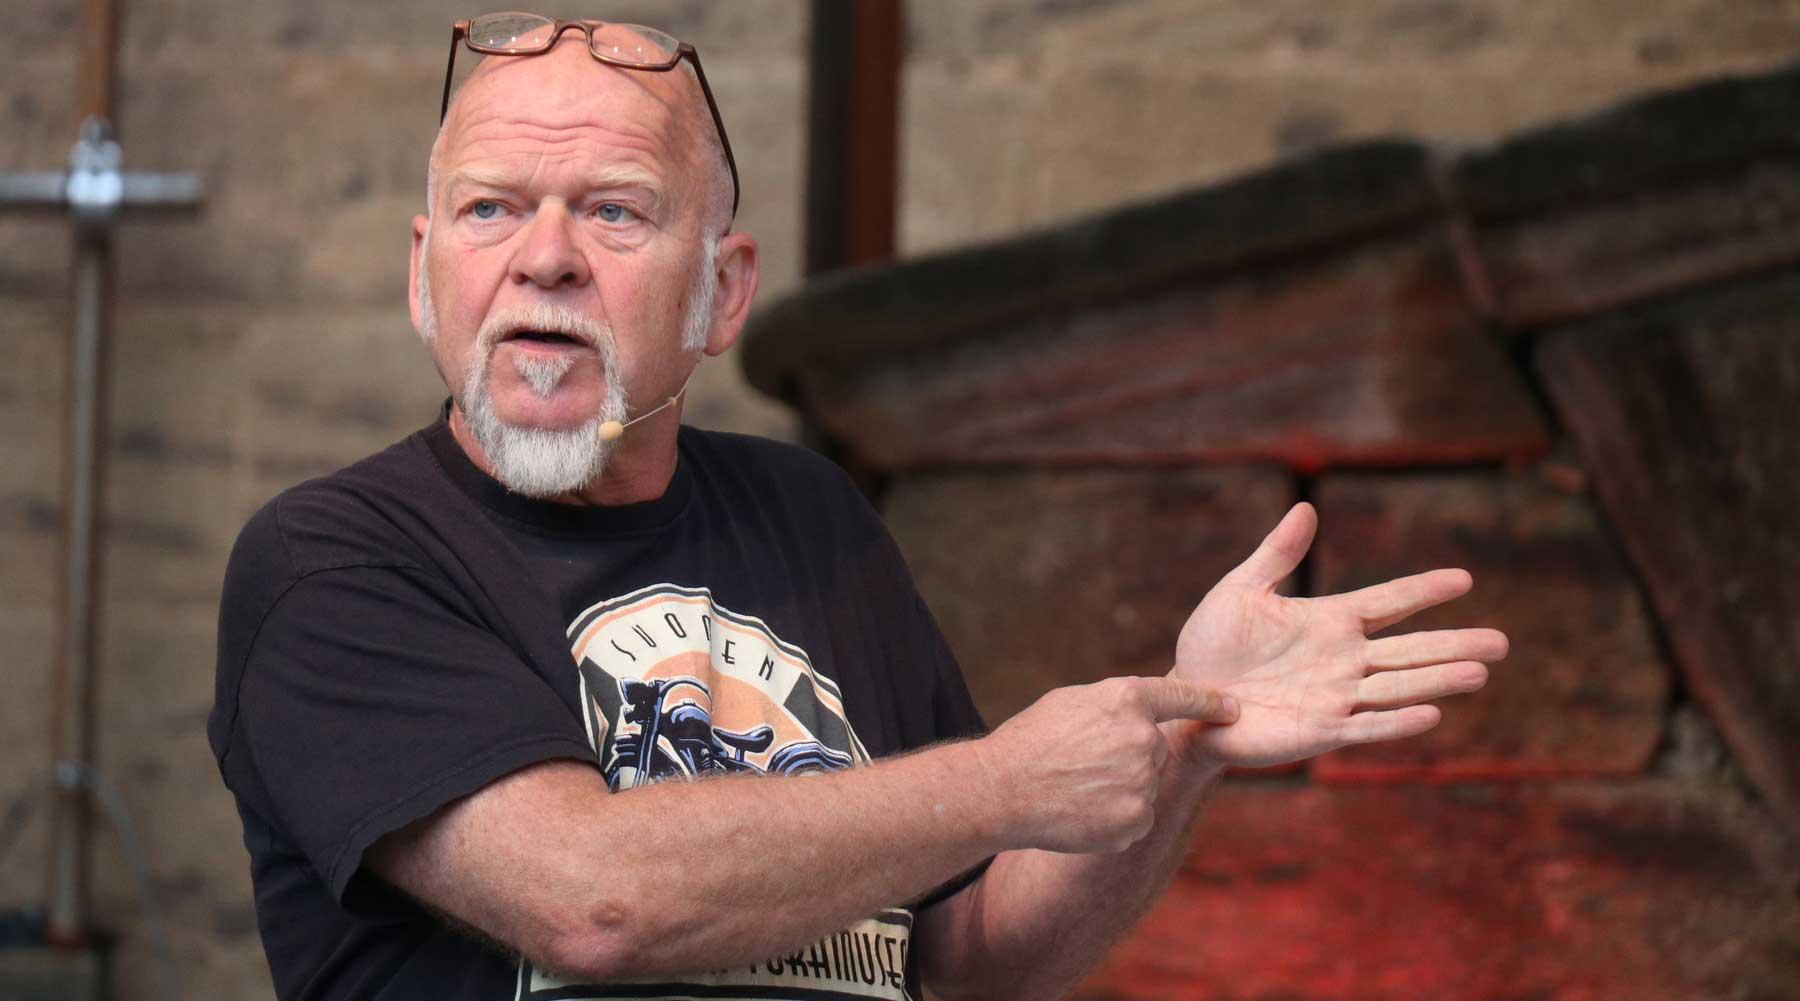 Bernd Gieseking | Kabarett